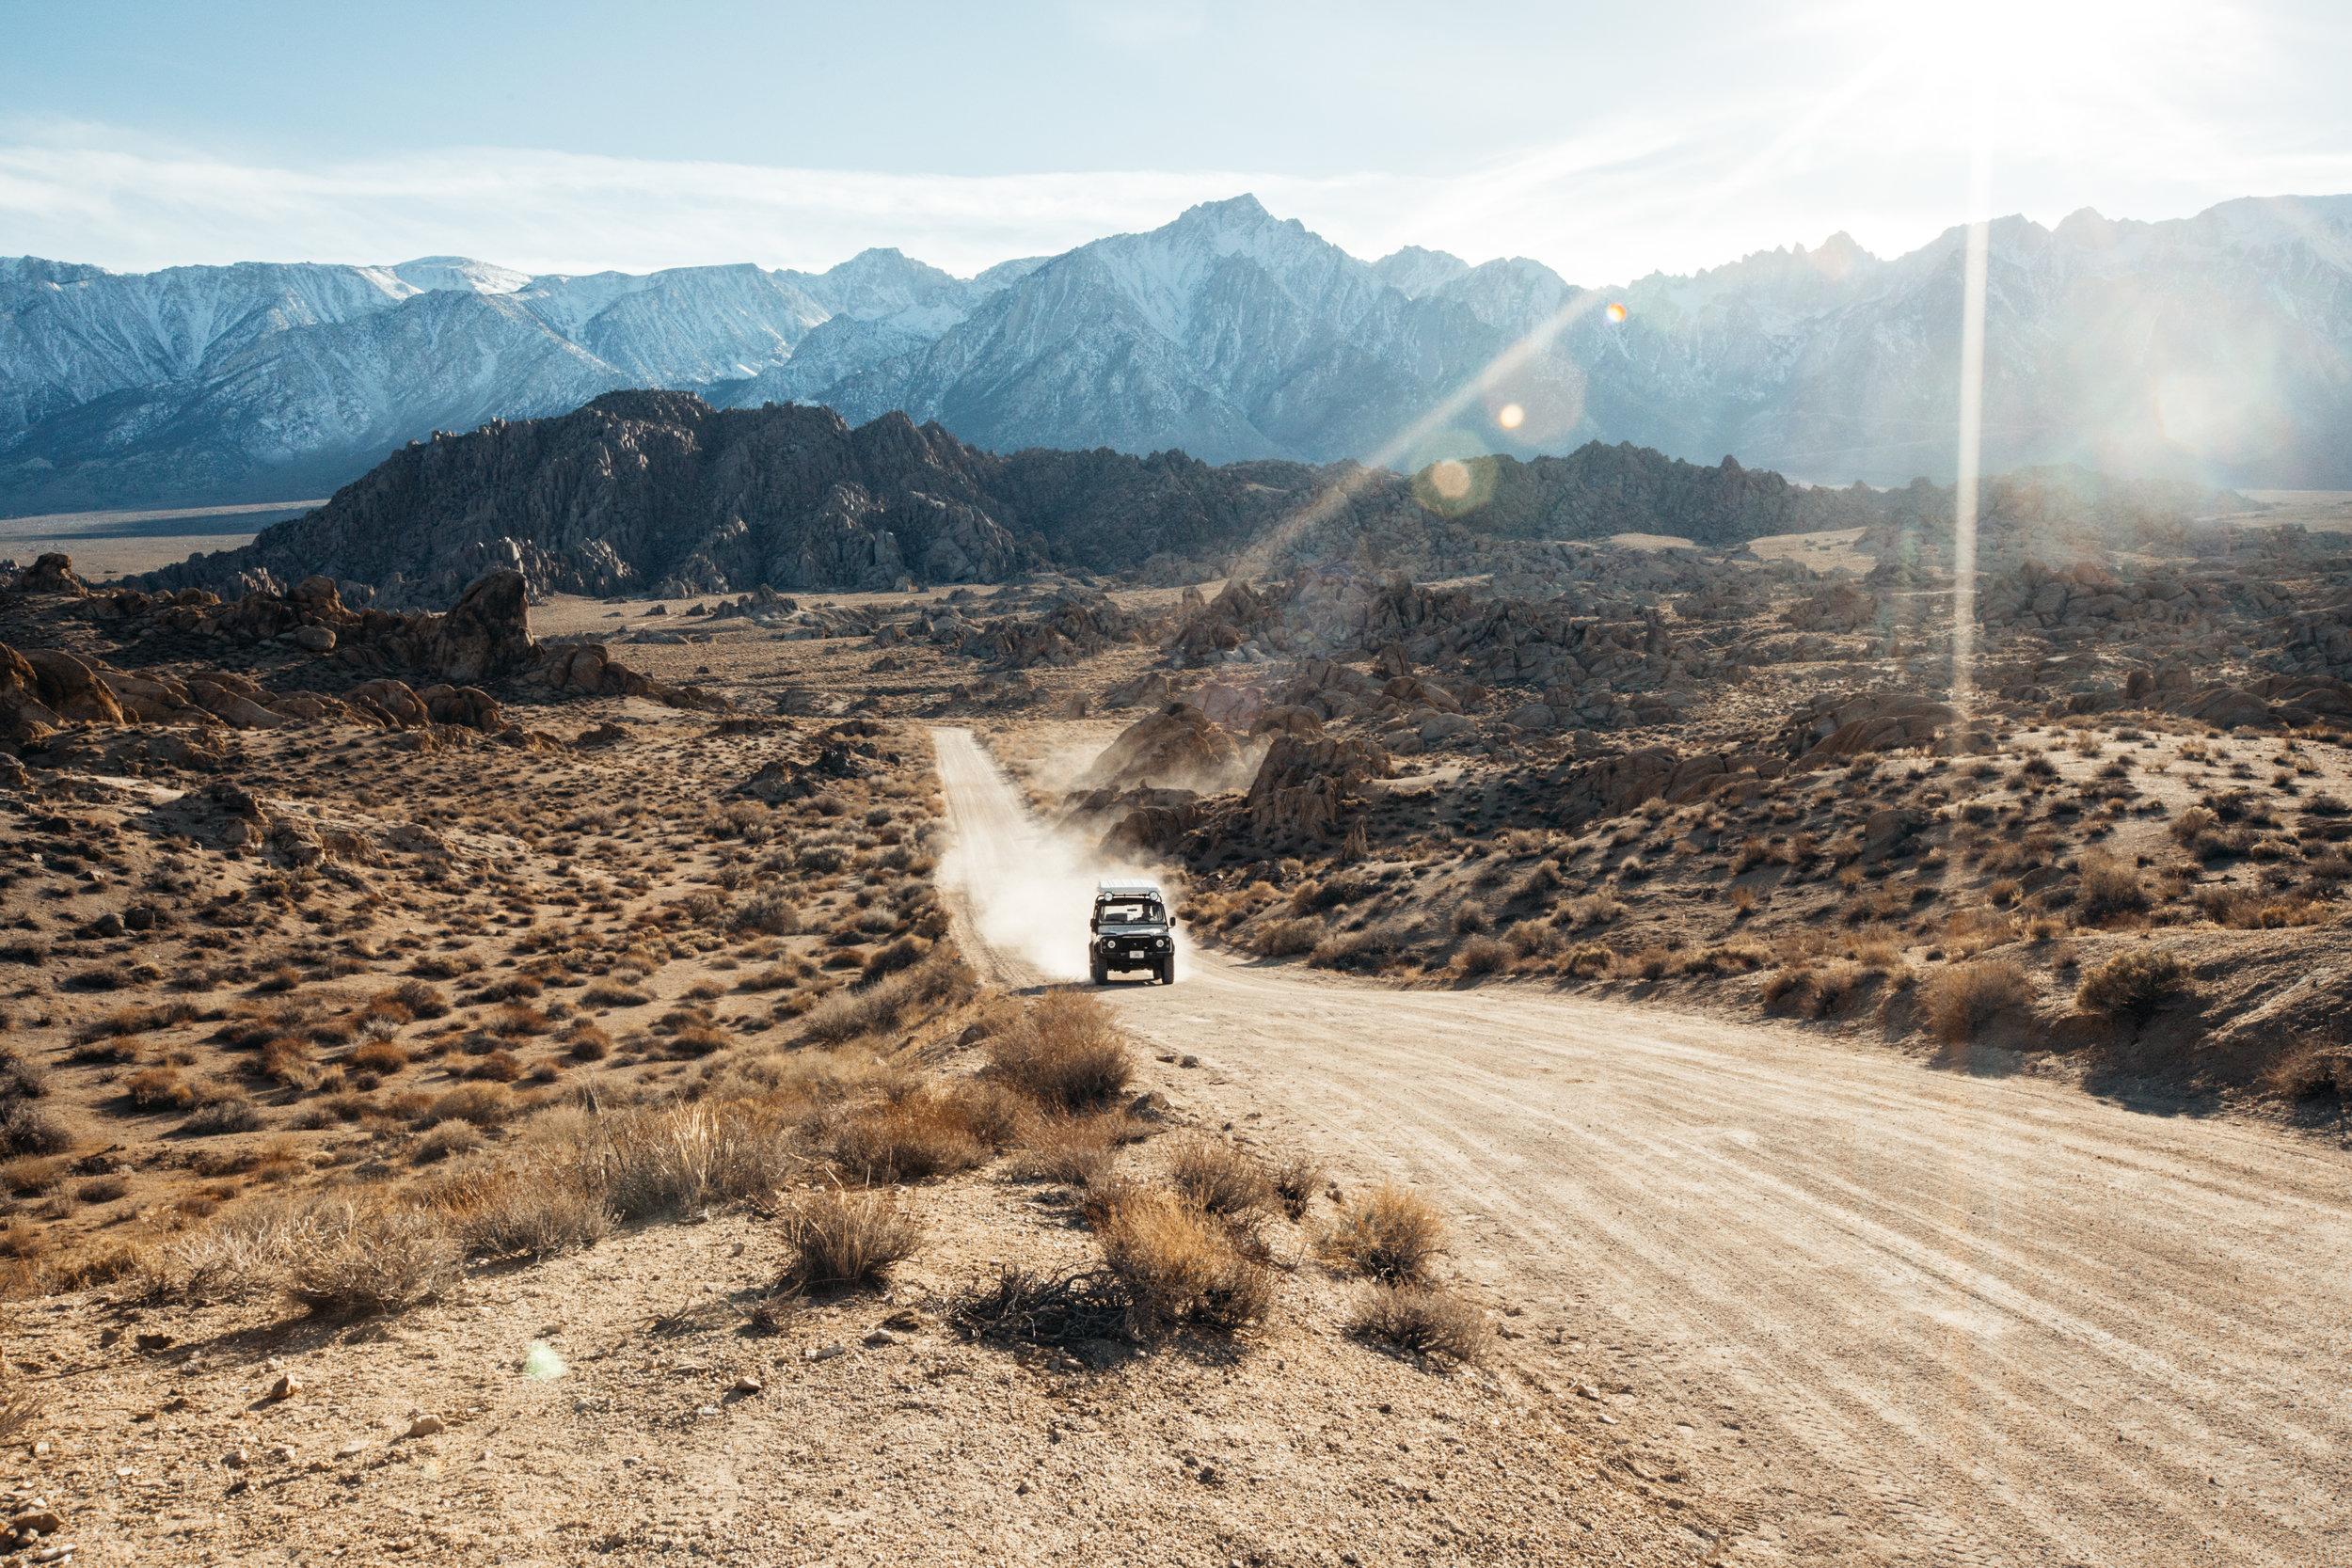 California_Roadtrip-178.jpg